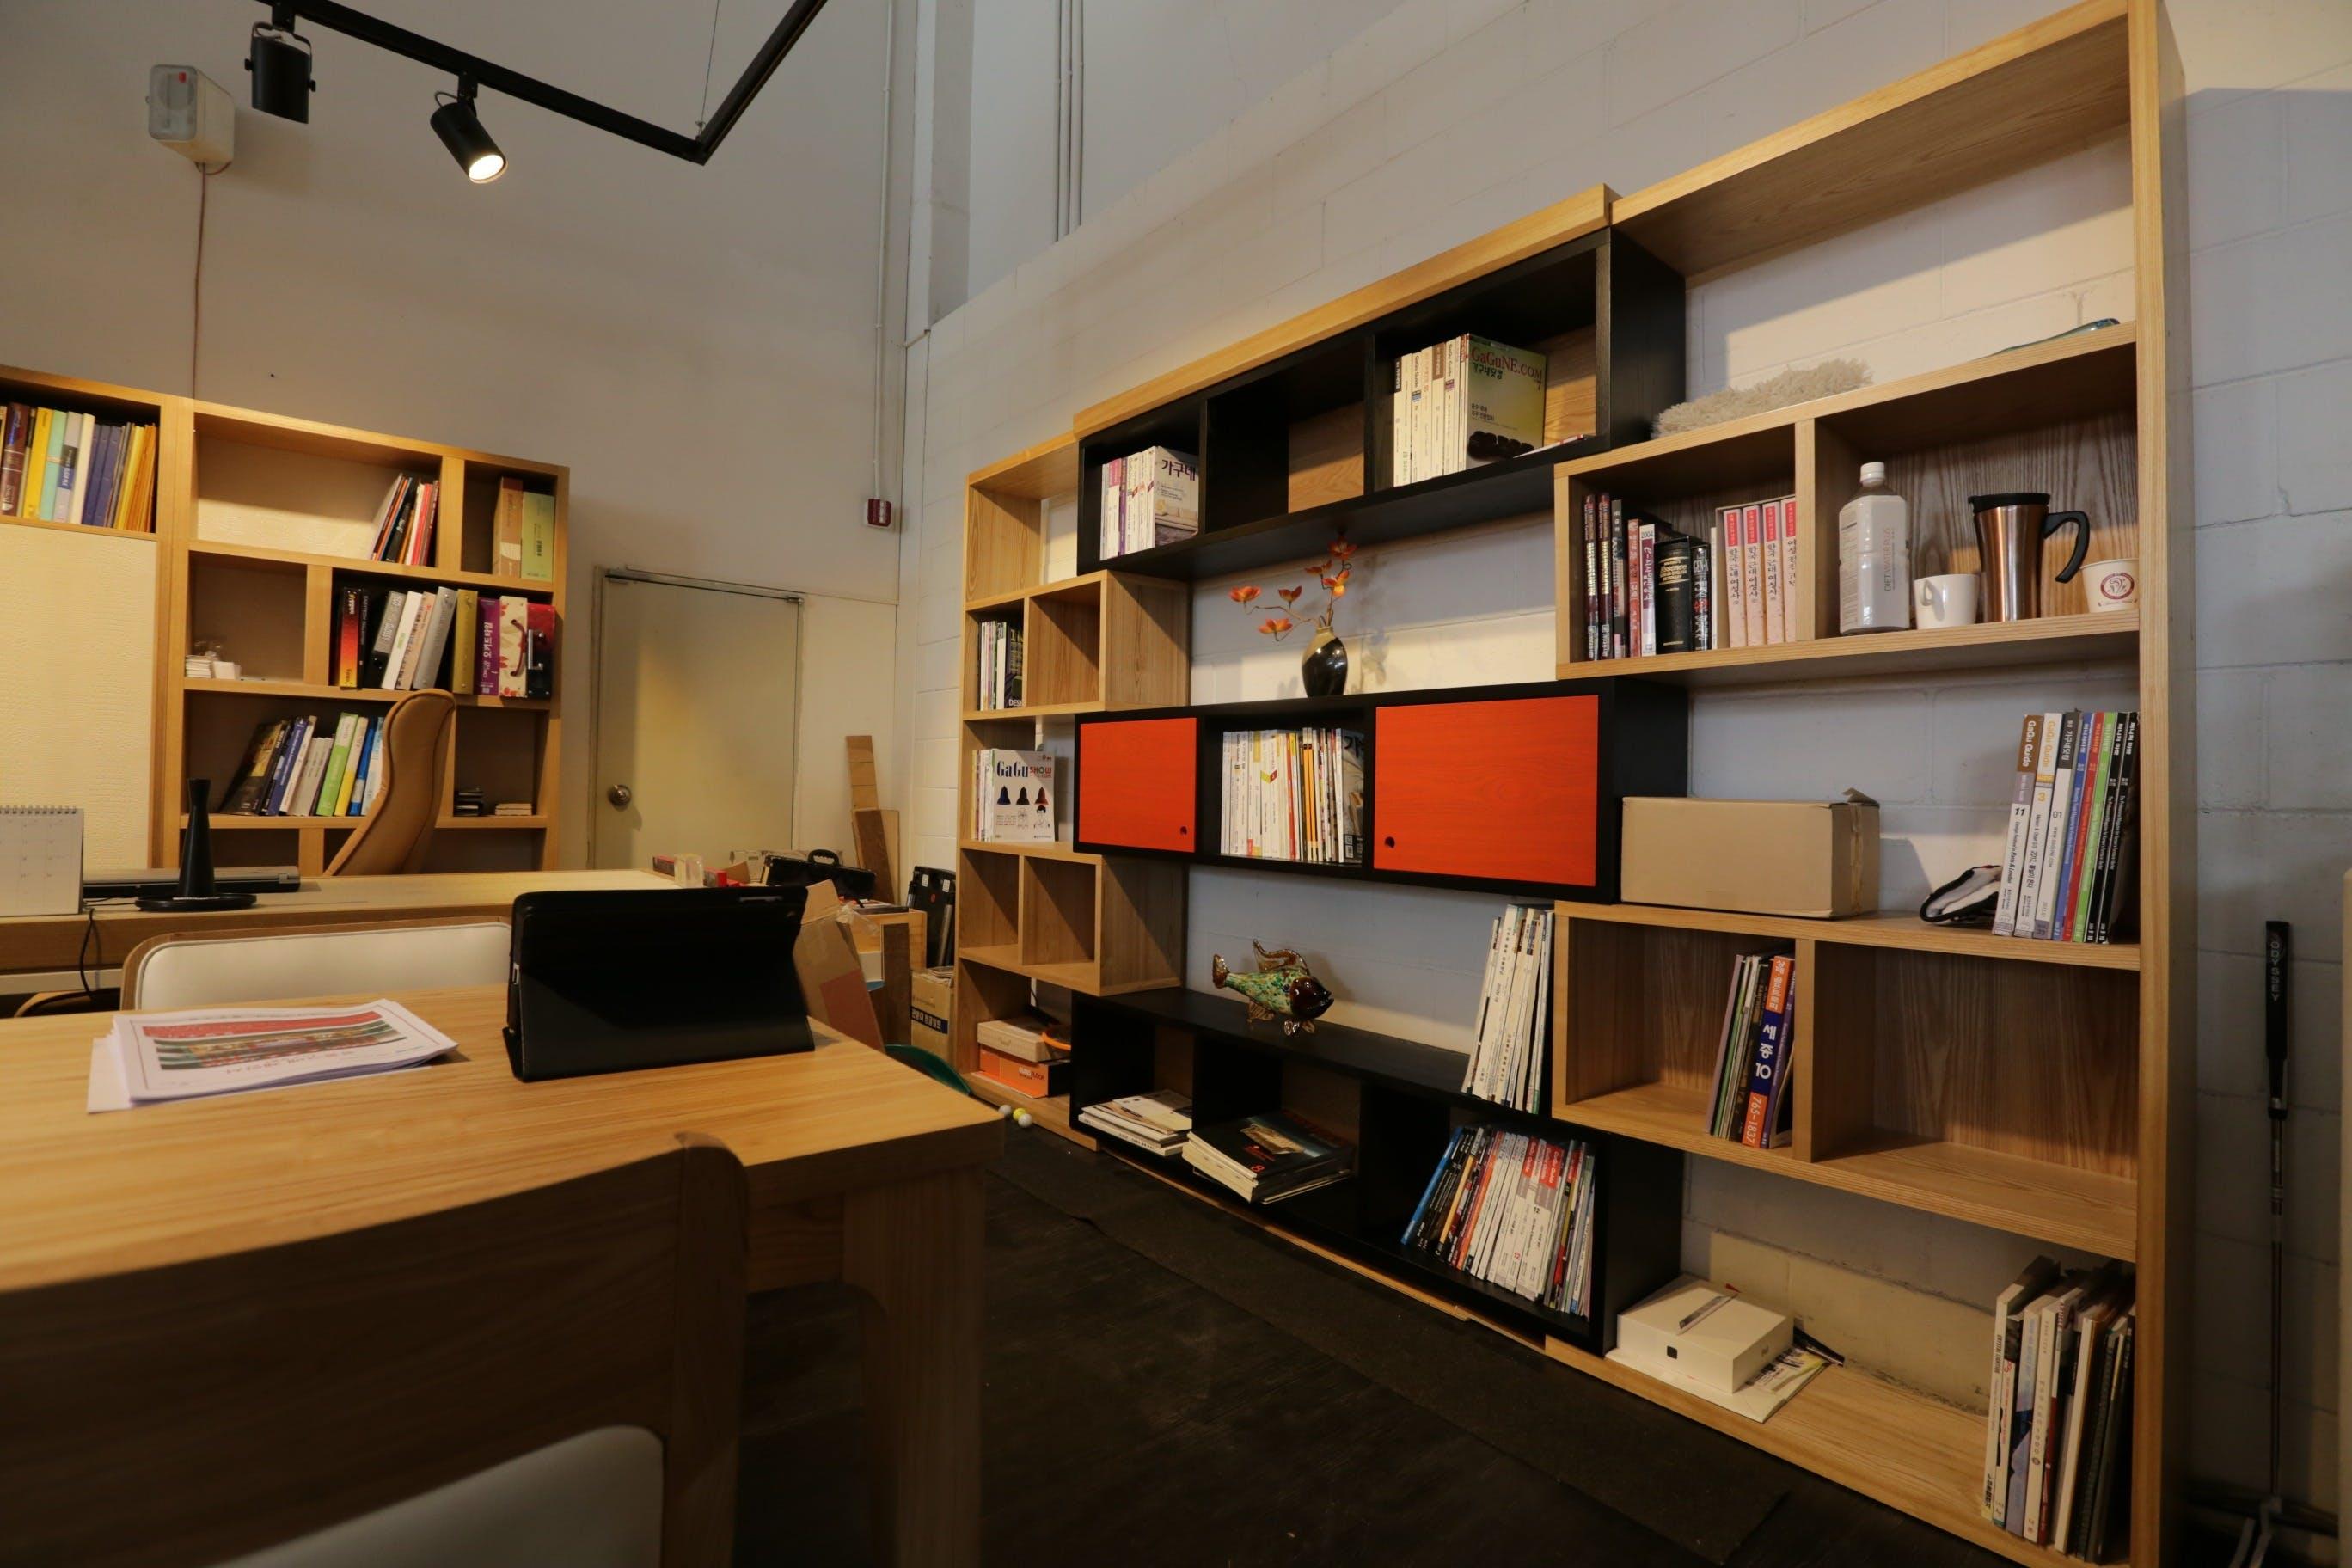 apartment, comfort, comfortable